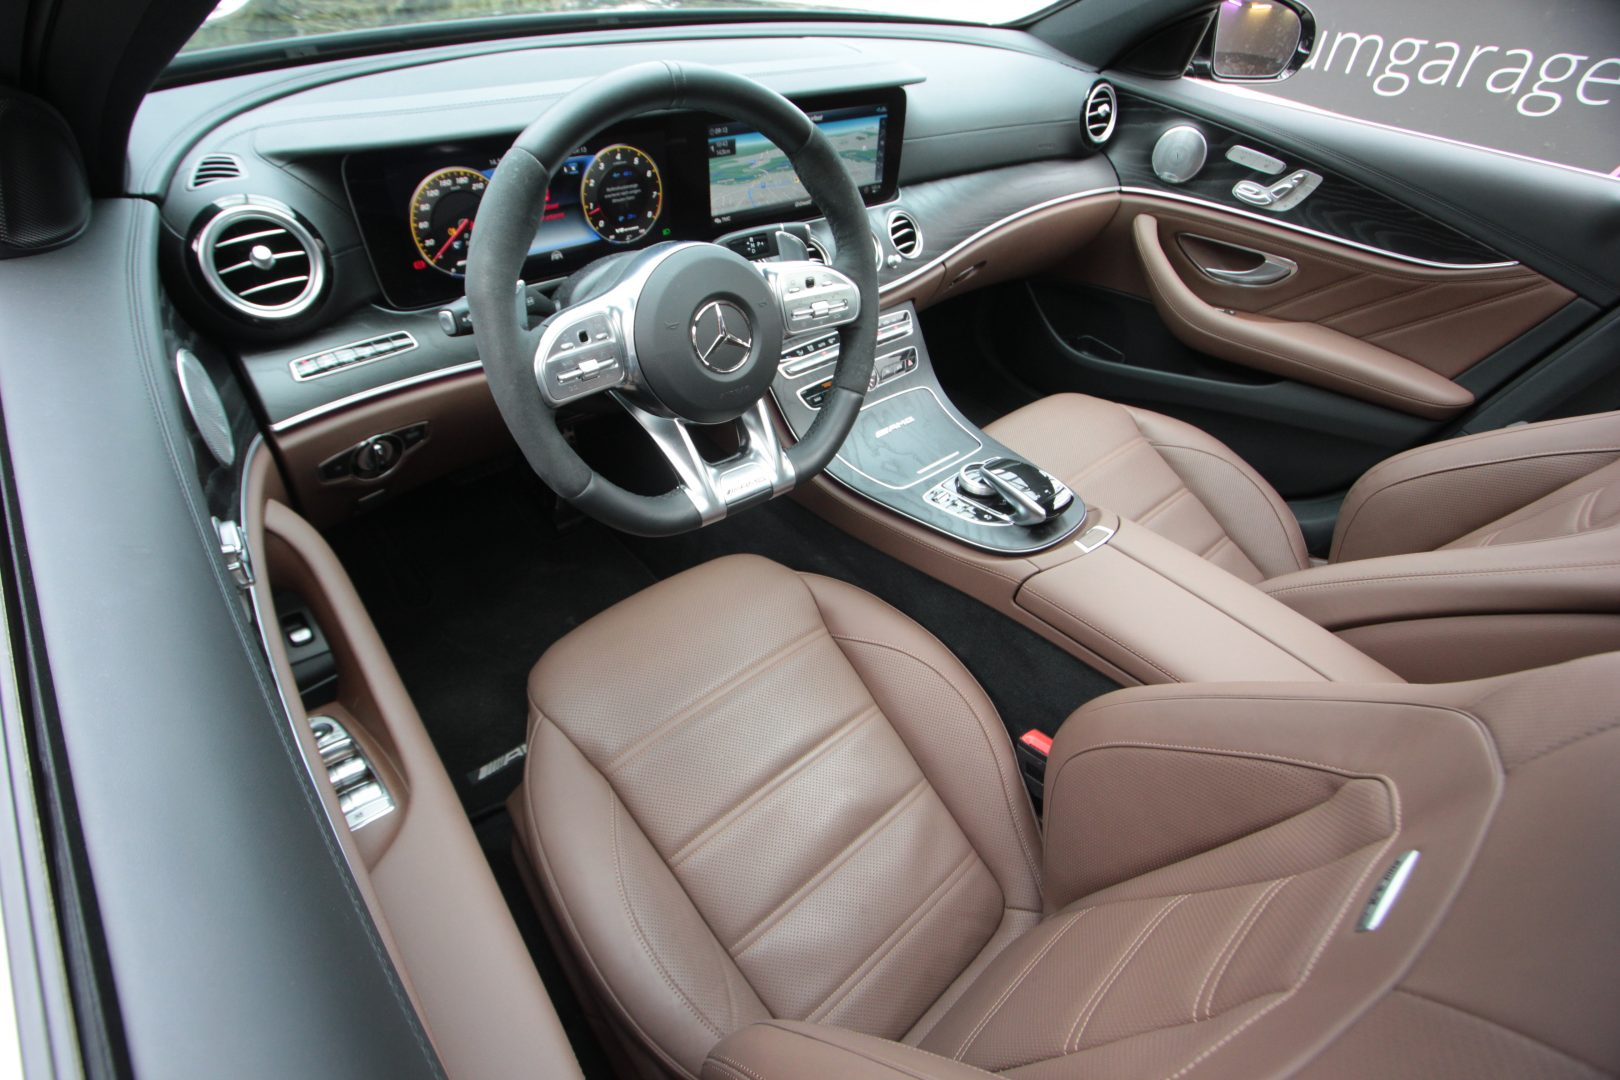 AIL Mercedes-Benz  E 63 AMG S 4Matic 9